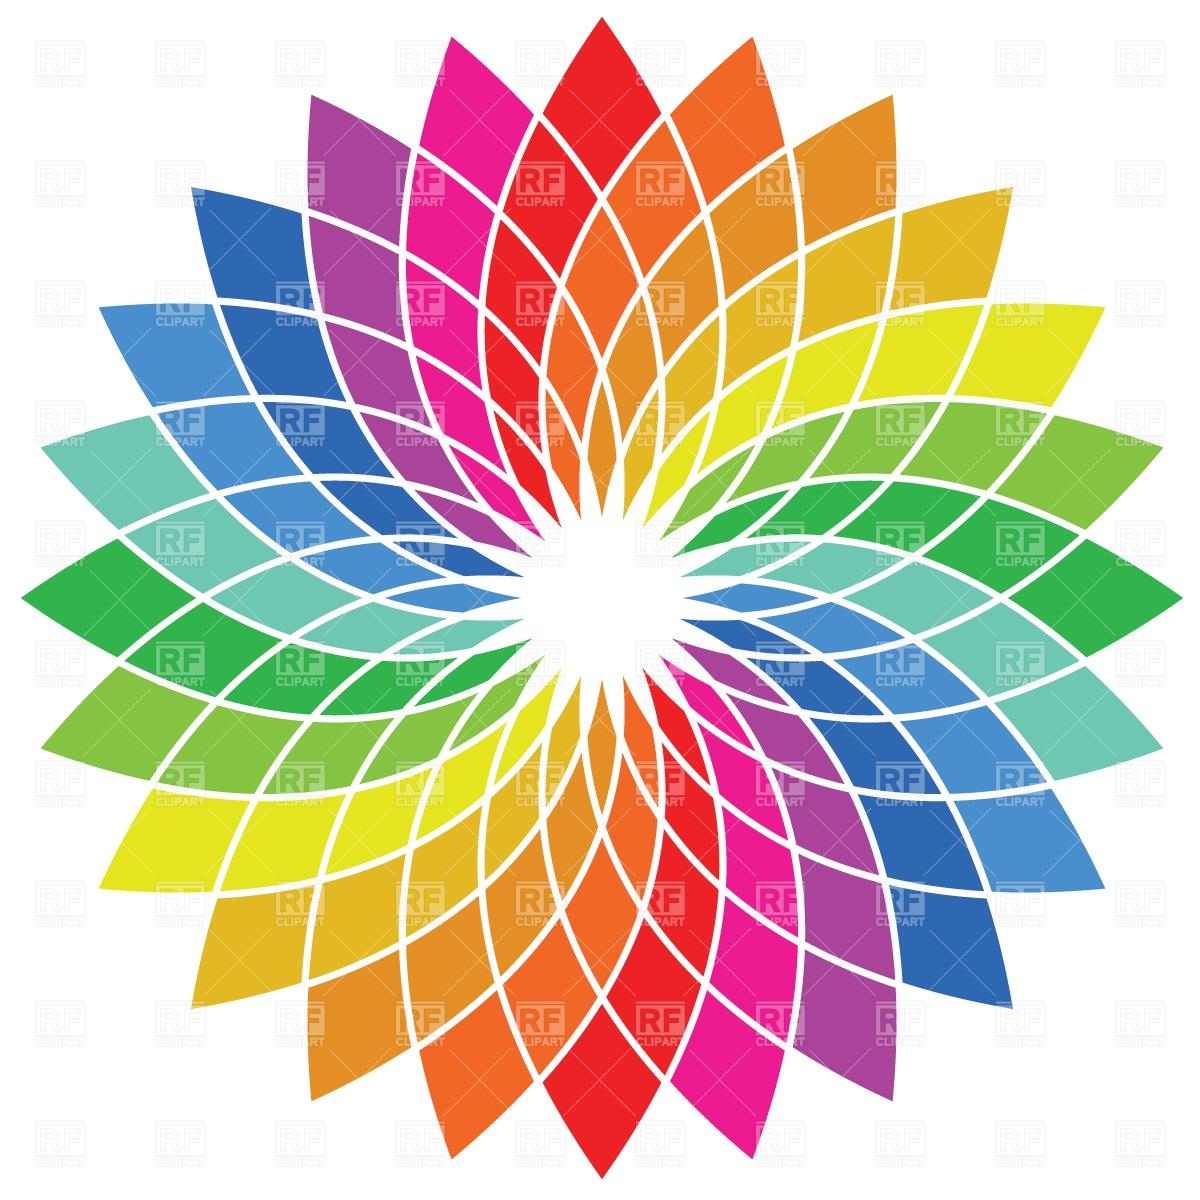 Color spectrum clipart 20 free Cliparts | Download images ...